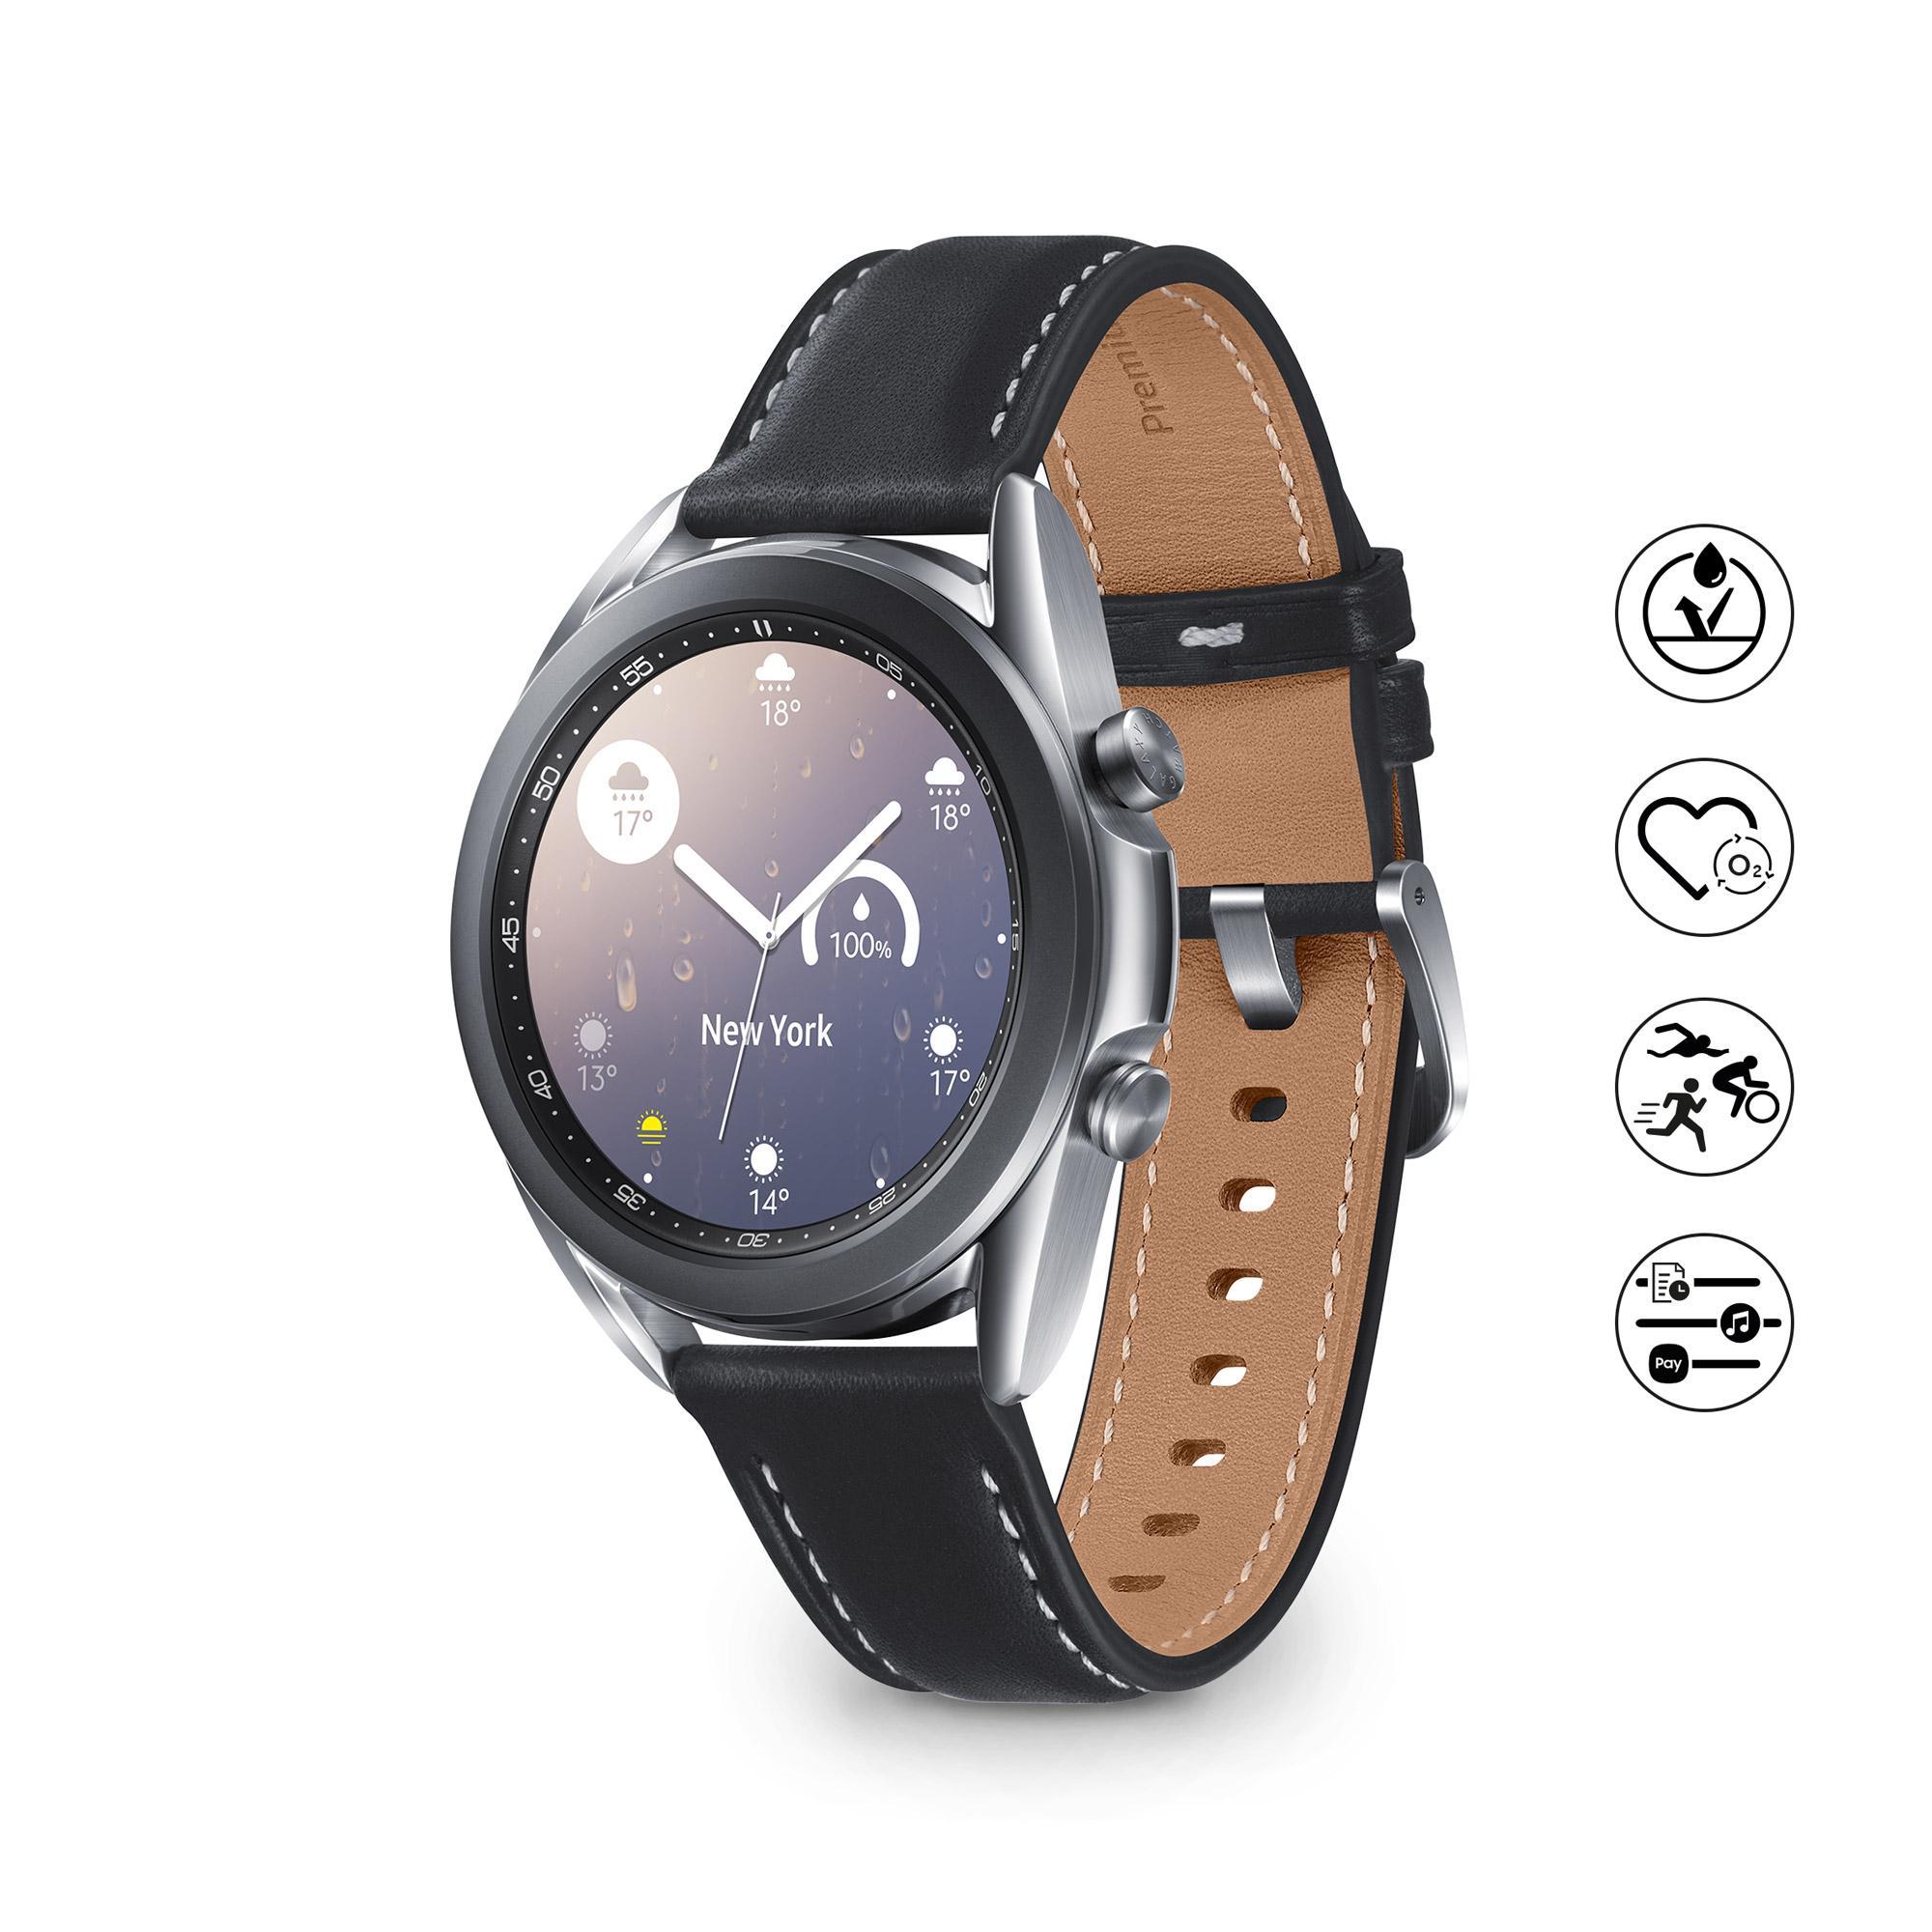 Samsung Galaxy Watch3 Smartwatch Bluetooth, cassa 41mm acciaio, cinturino pelle, Saturimetro, Rilevamento cadute, Monitoraggio sport, 48,2g, Batteria 247 mAh, IP68, Mystic Silver